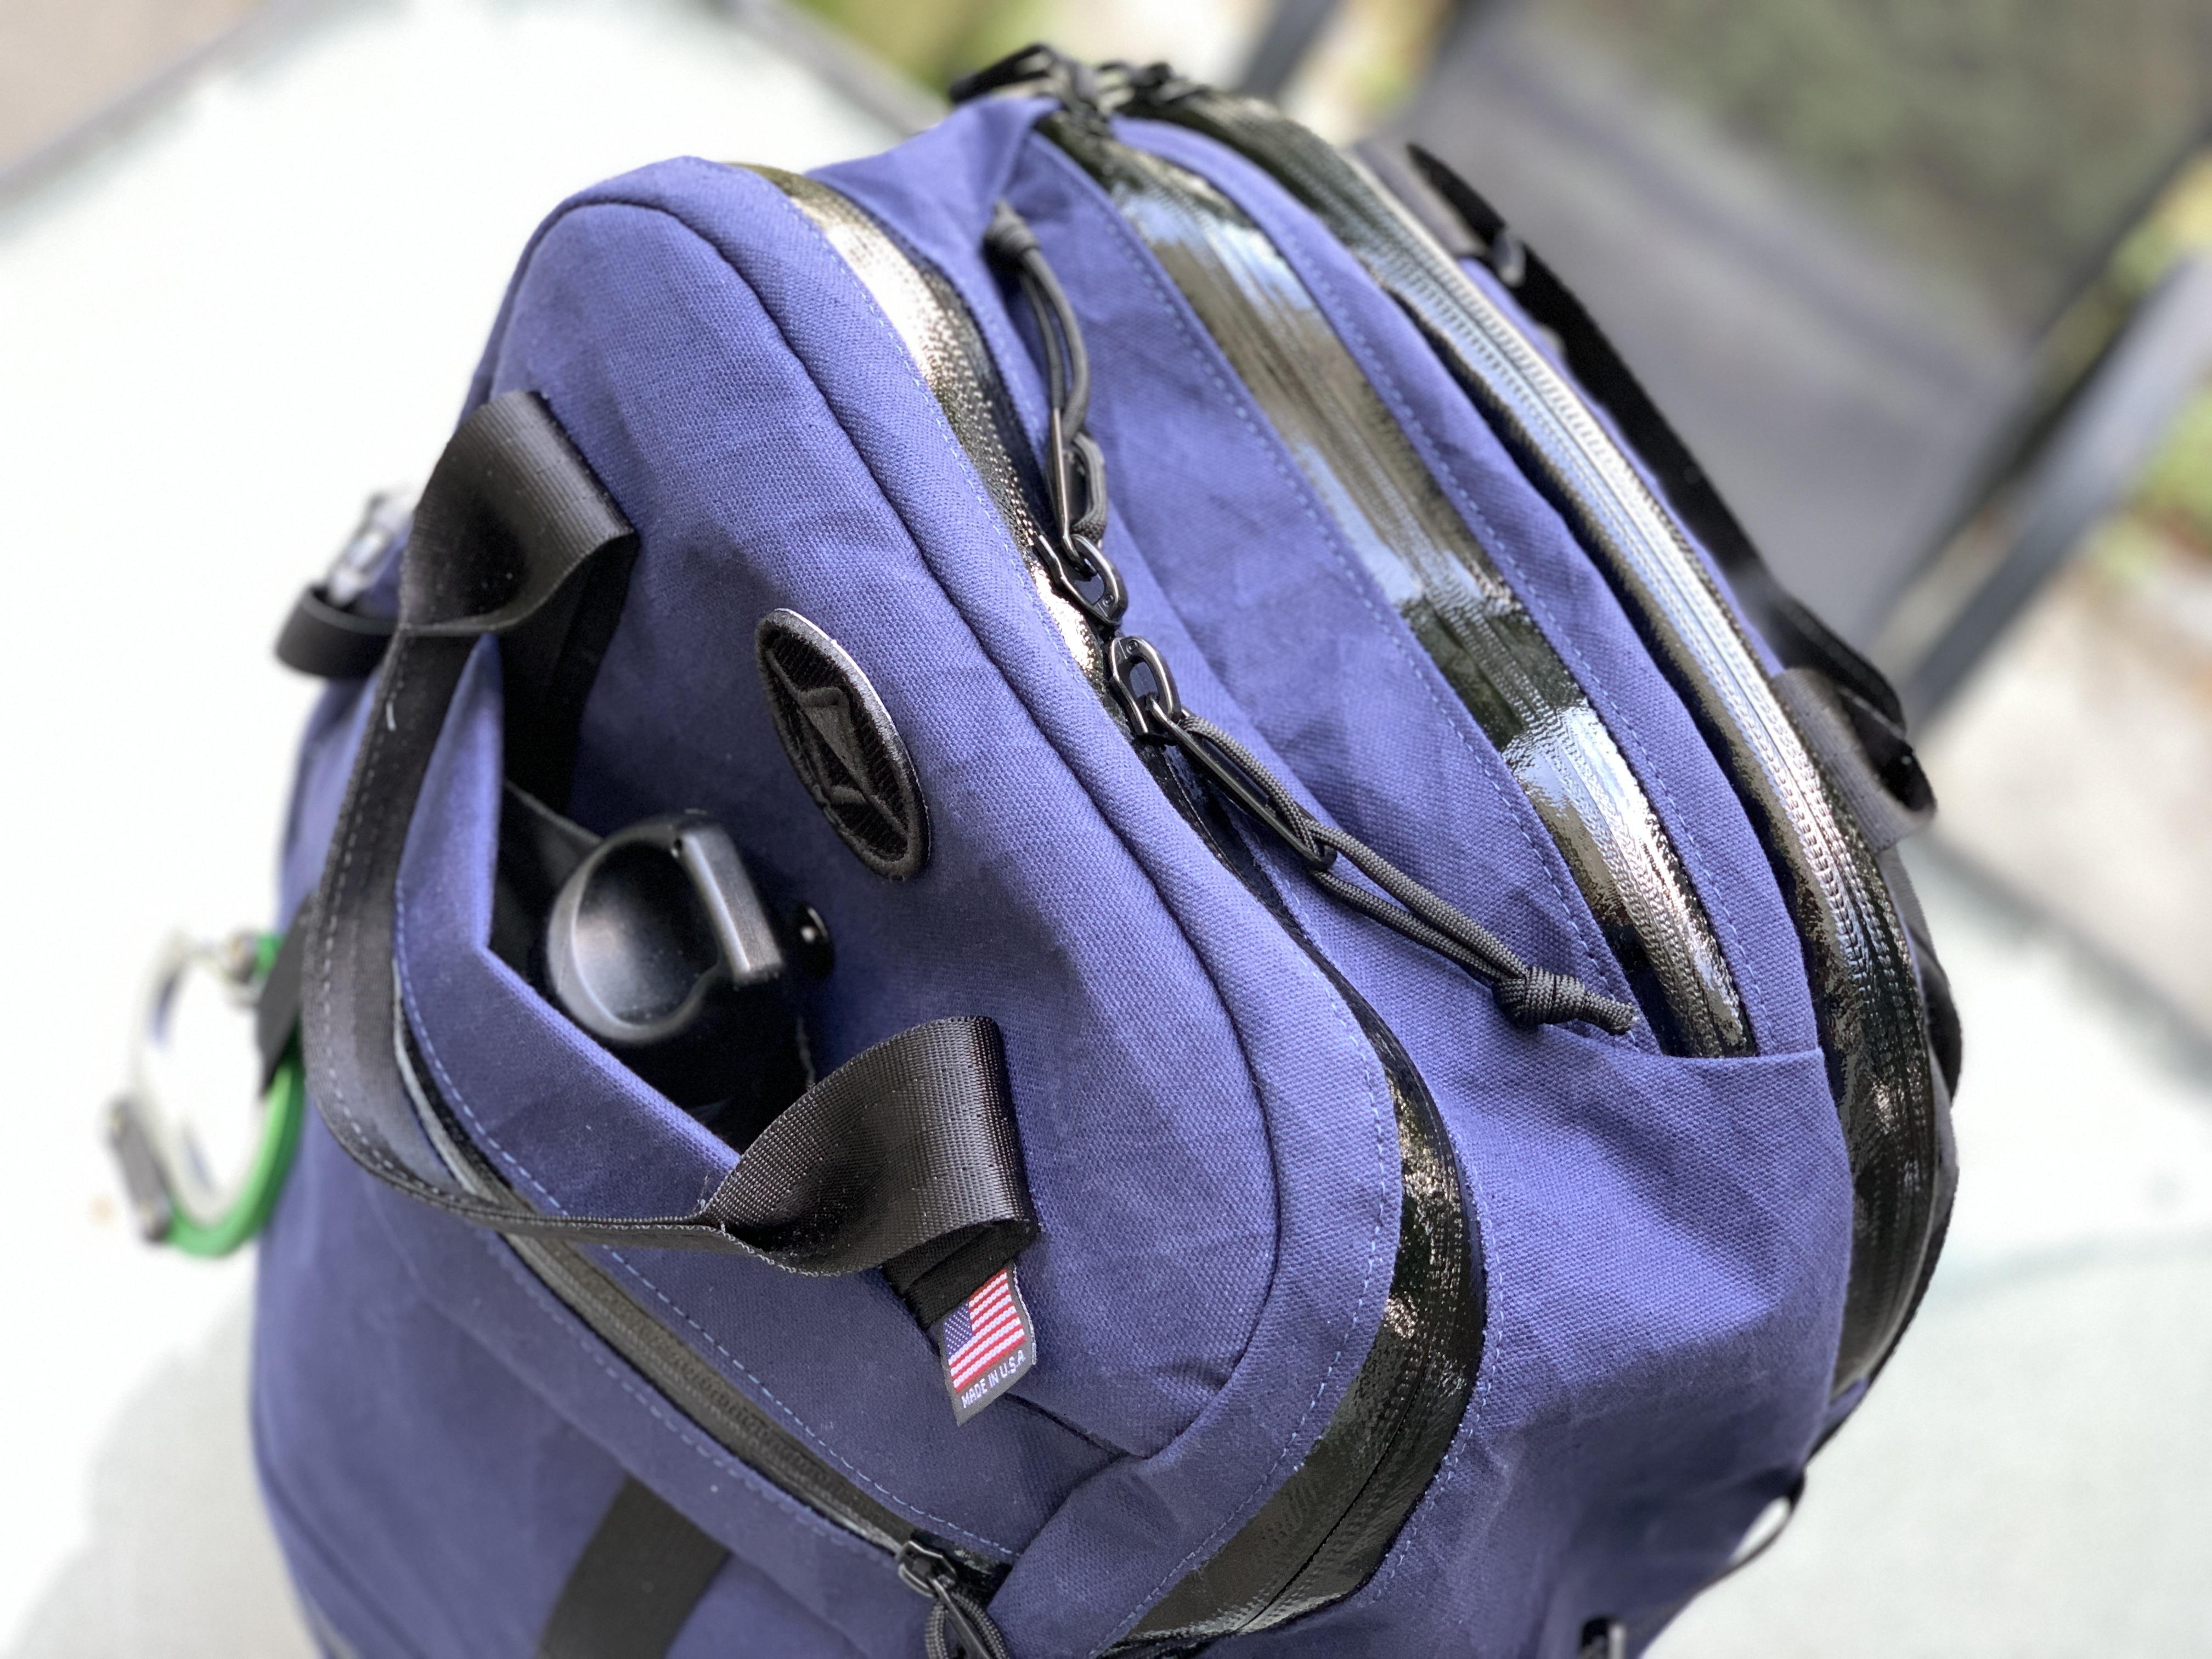 North St Bags Weekender front water bottle pocket